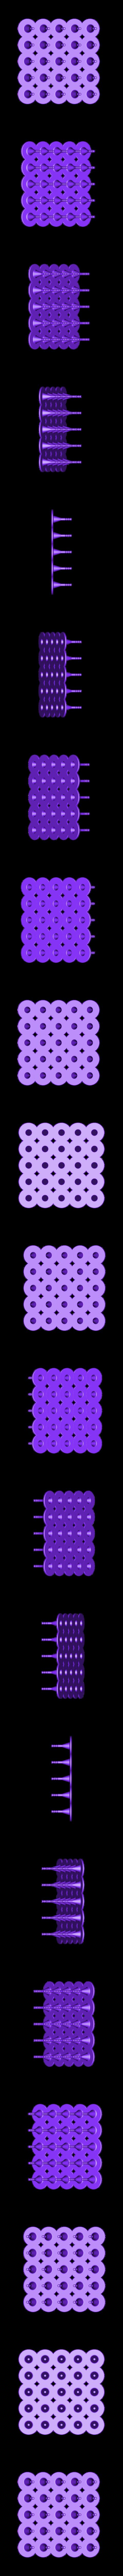 GeoBoard5x5_B.stl Download free STL file Geoboard, Geometric Board, Cartesian, Isometic, Circular, Geometry, Math • 3D printer object, LGBU